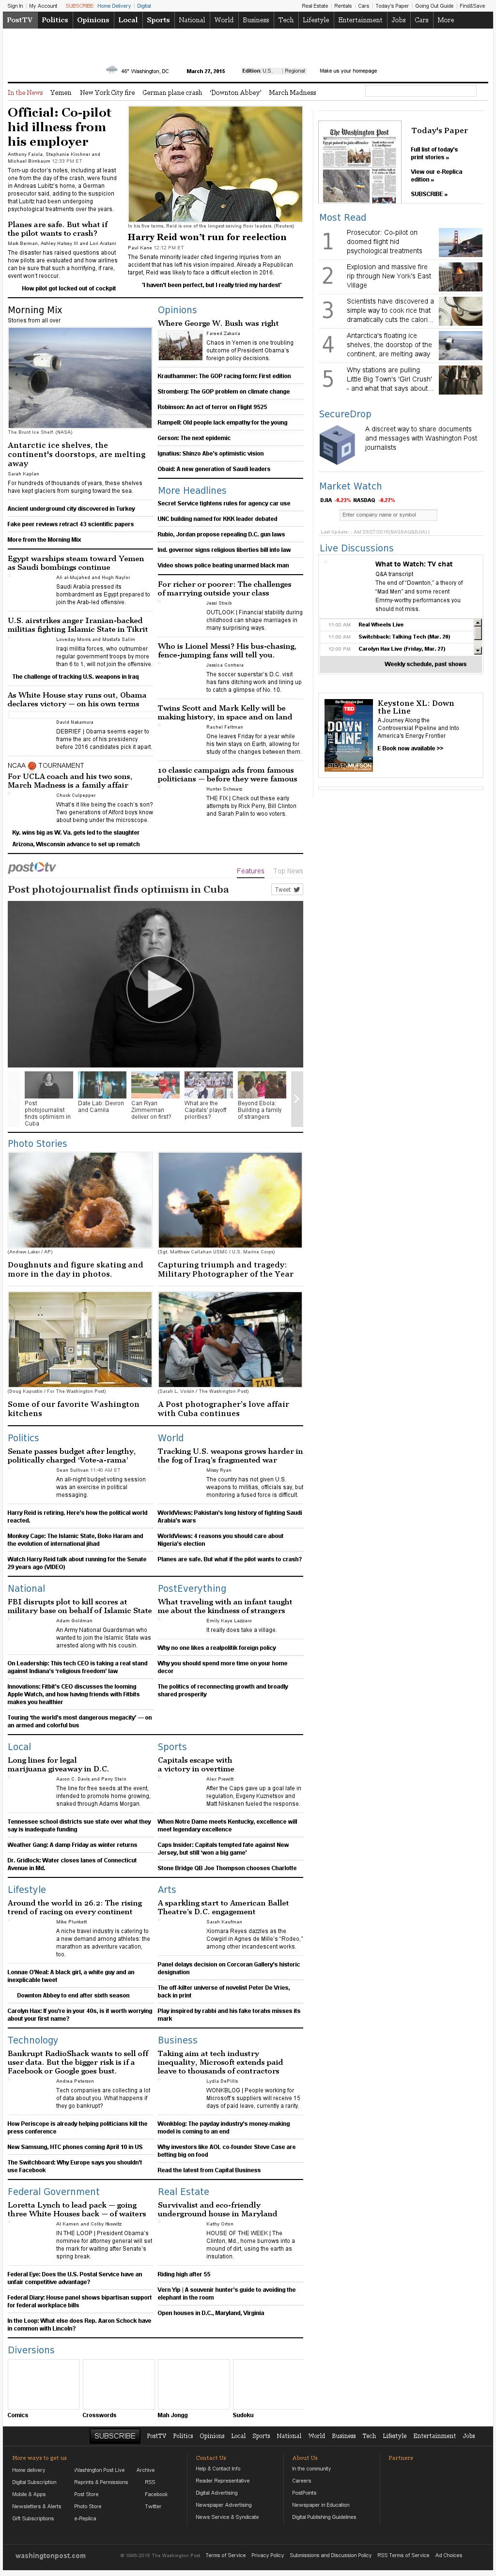 The Washington Post at Friday March 27, 2015, 1:25 p.m. UTC